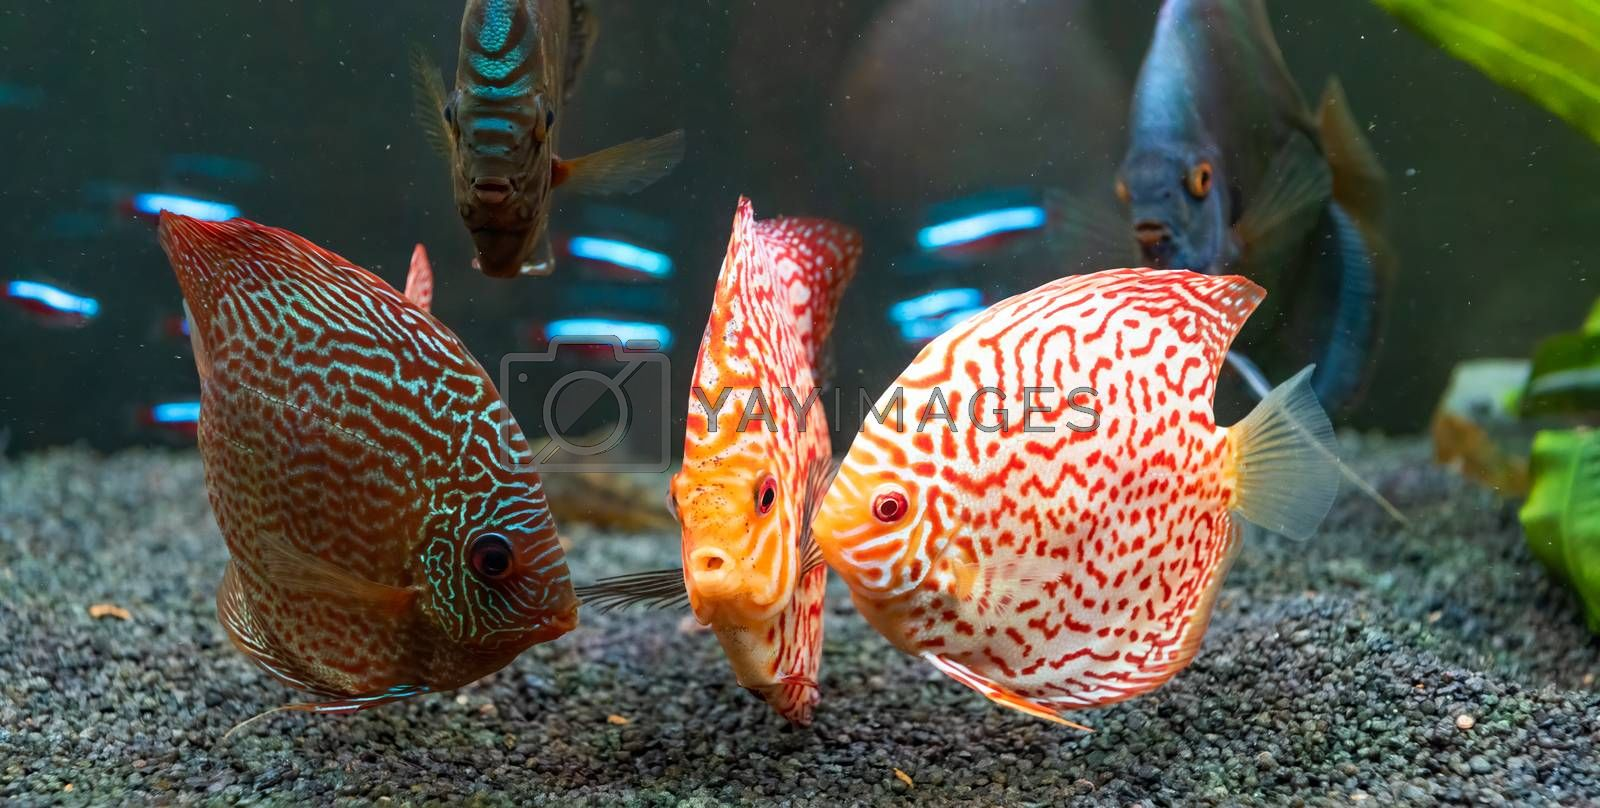 Colorful fish from the spieces Symphysodon discus in aquarium. Closeup, selective focus.